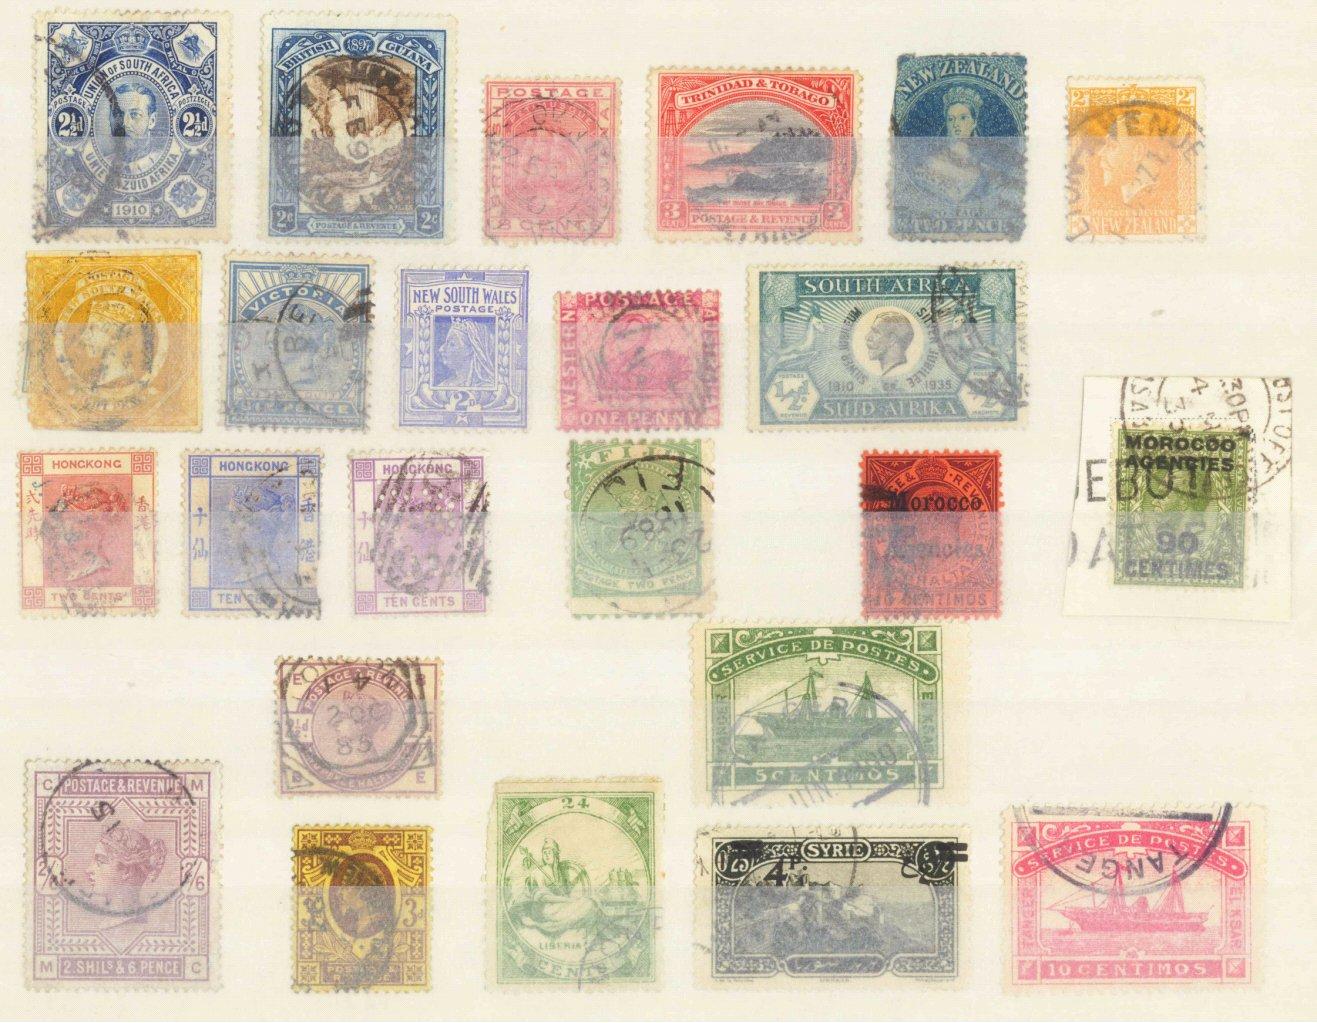 BRITISCHE KOLONIEN, klassische Marken ab 1860-1